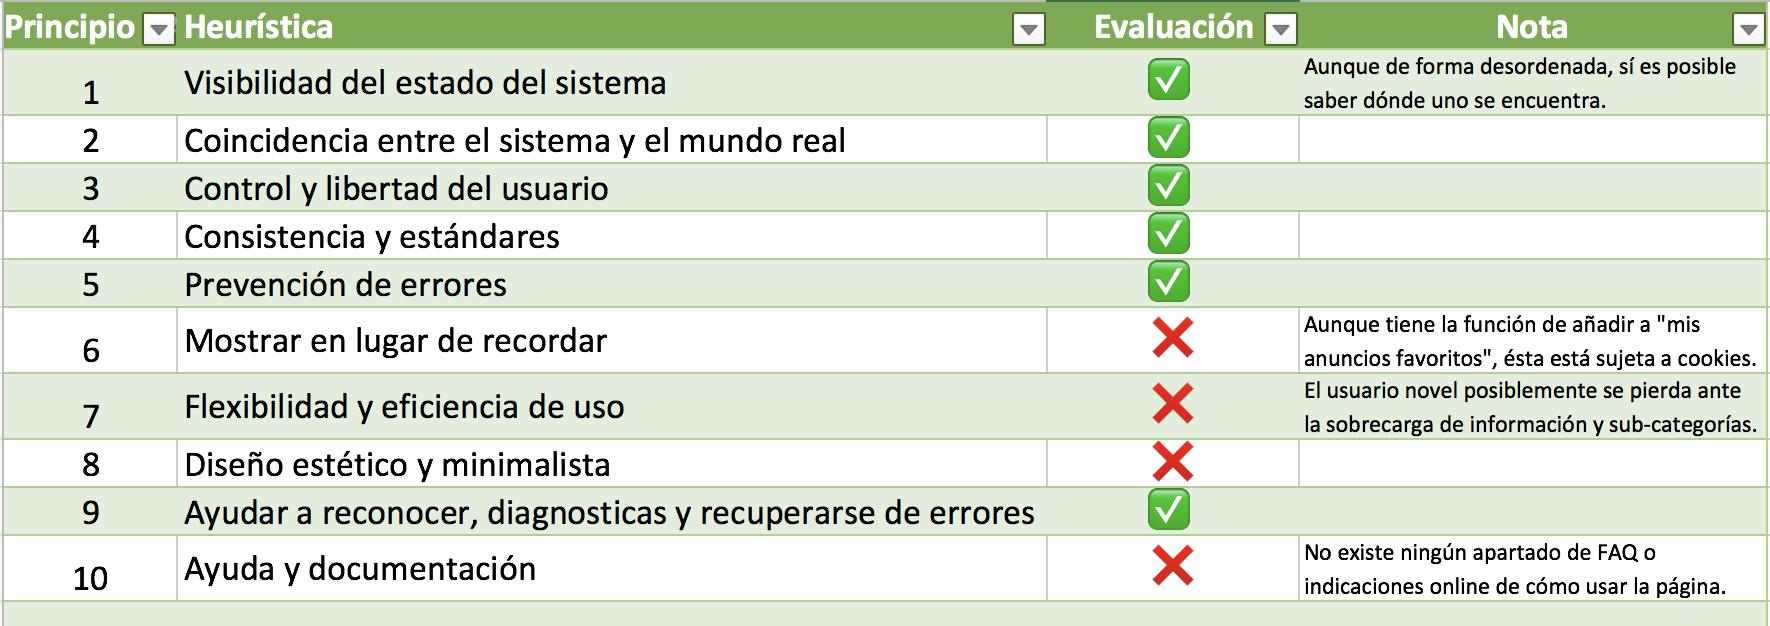 analisis-heuristico